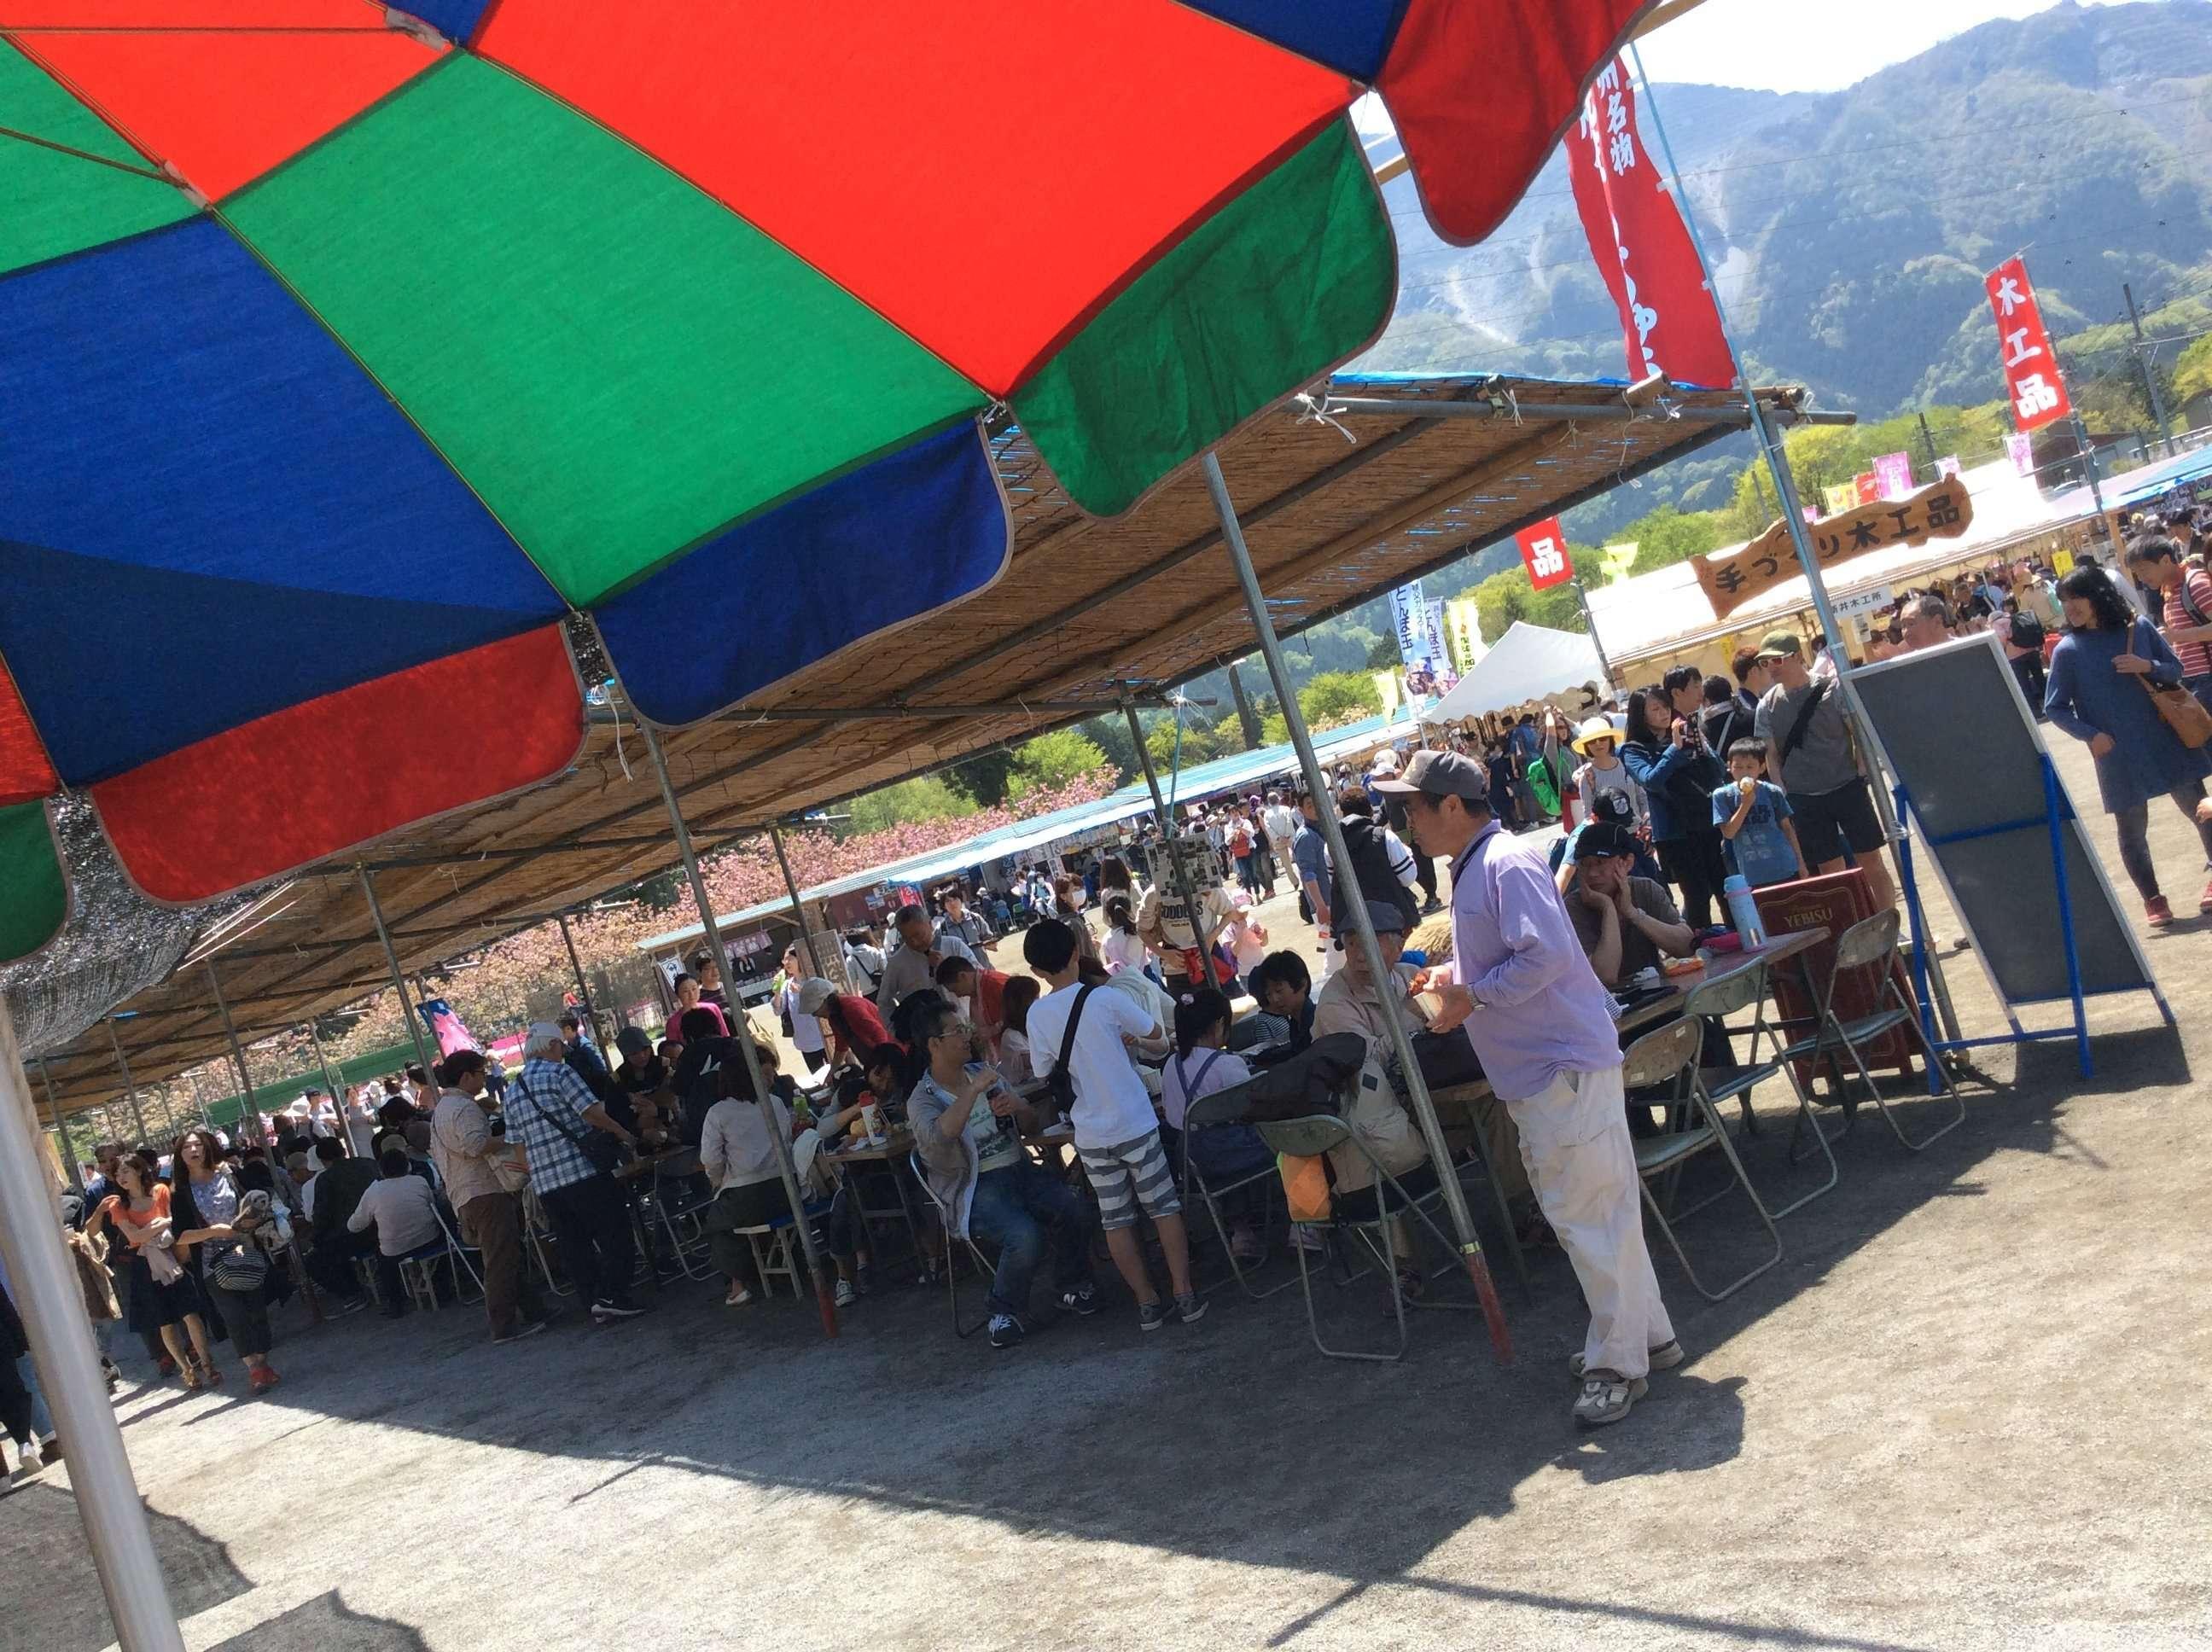 shibazakura festival in chichibu